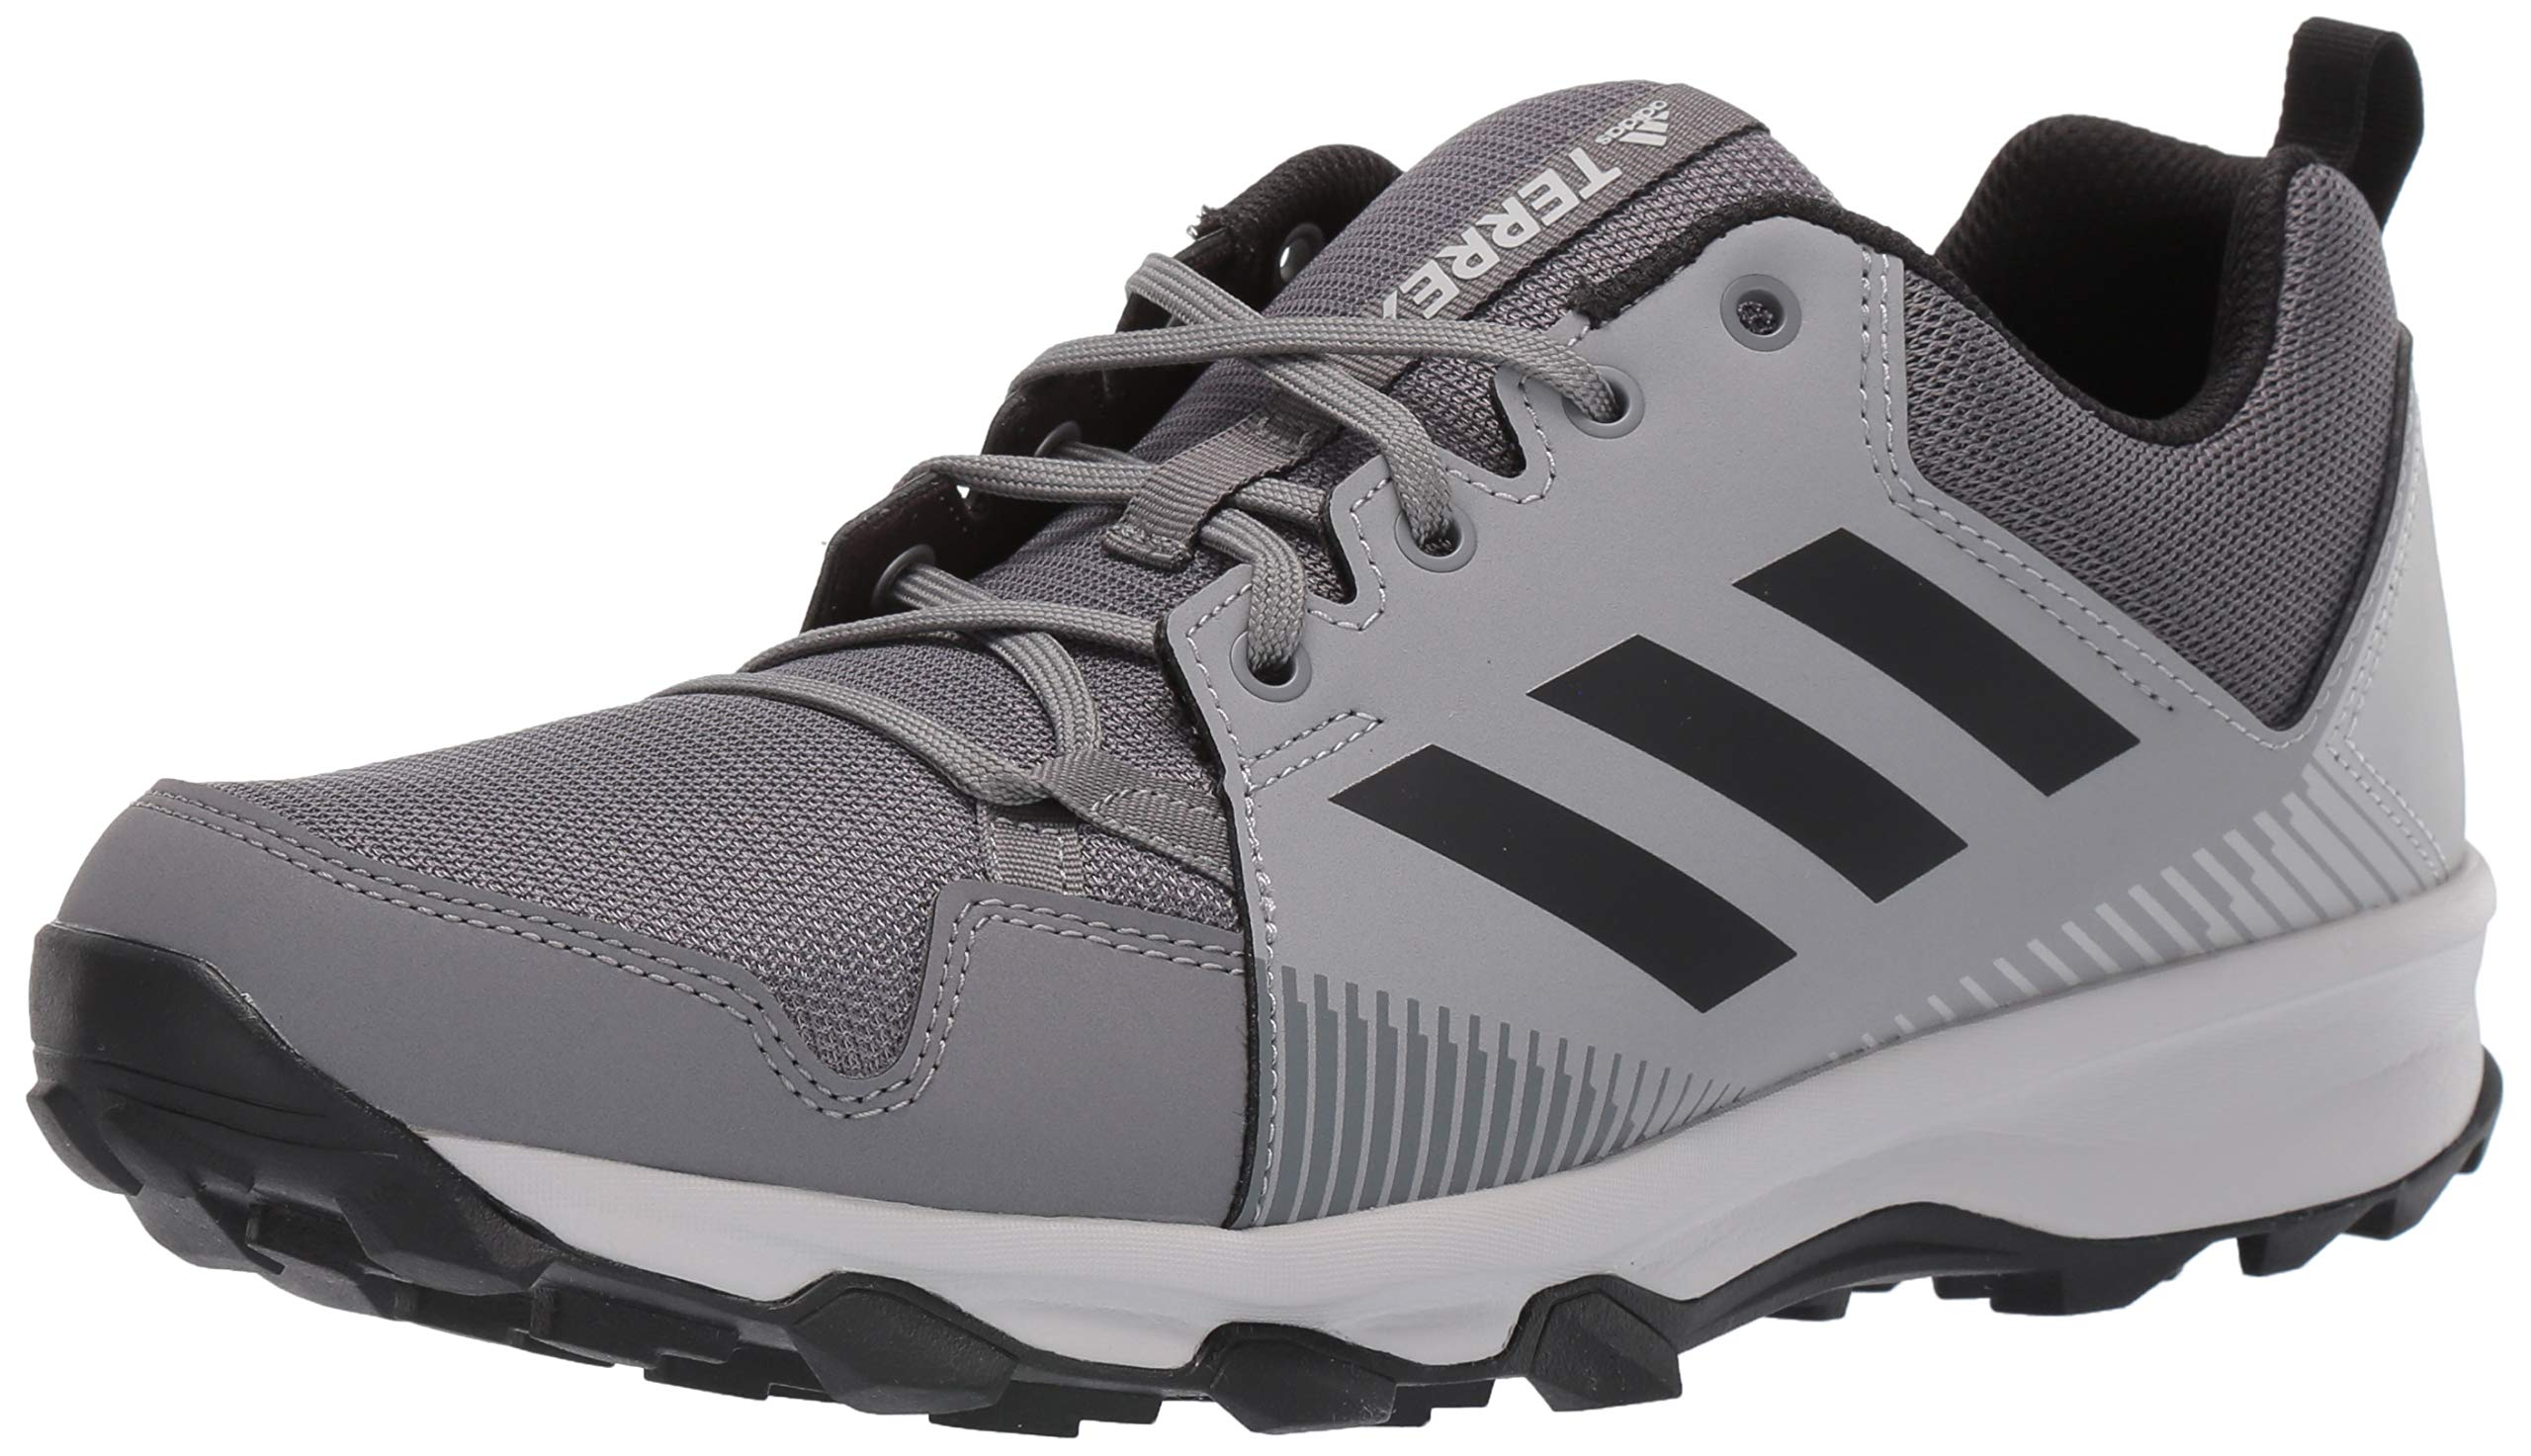 adidas outdoor Men's Terrex Tracerocker Athletic Shoe